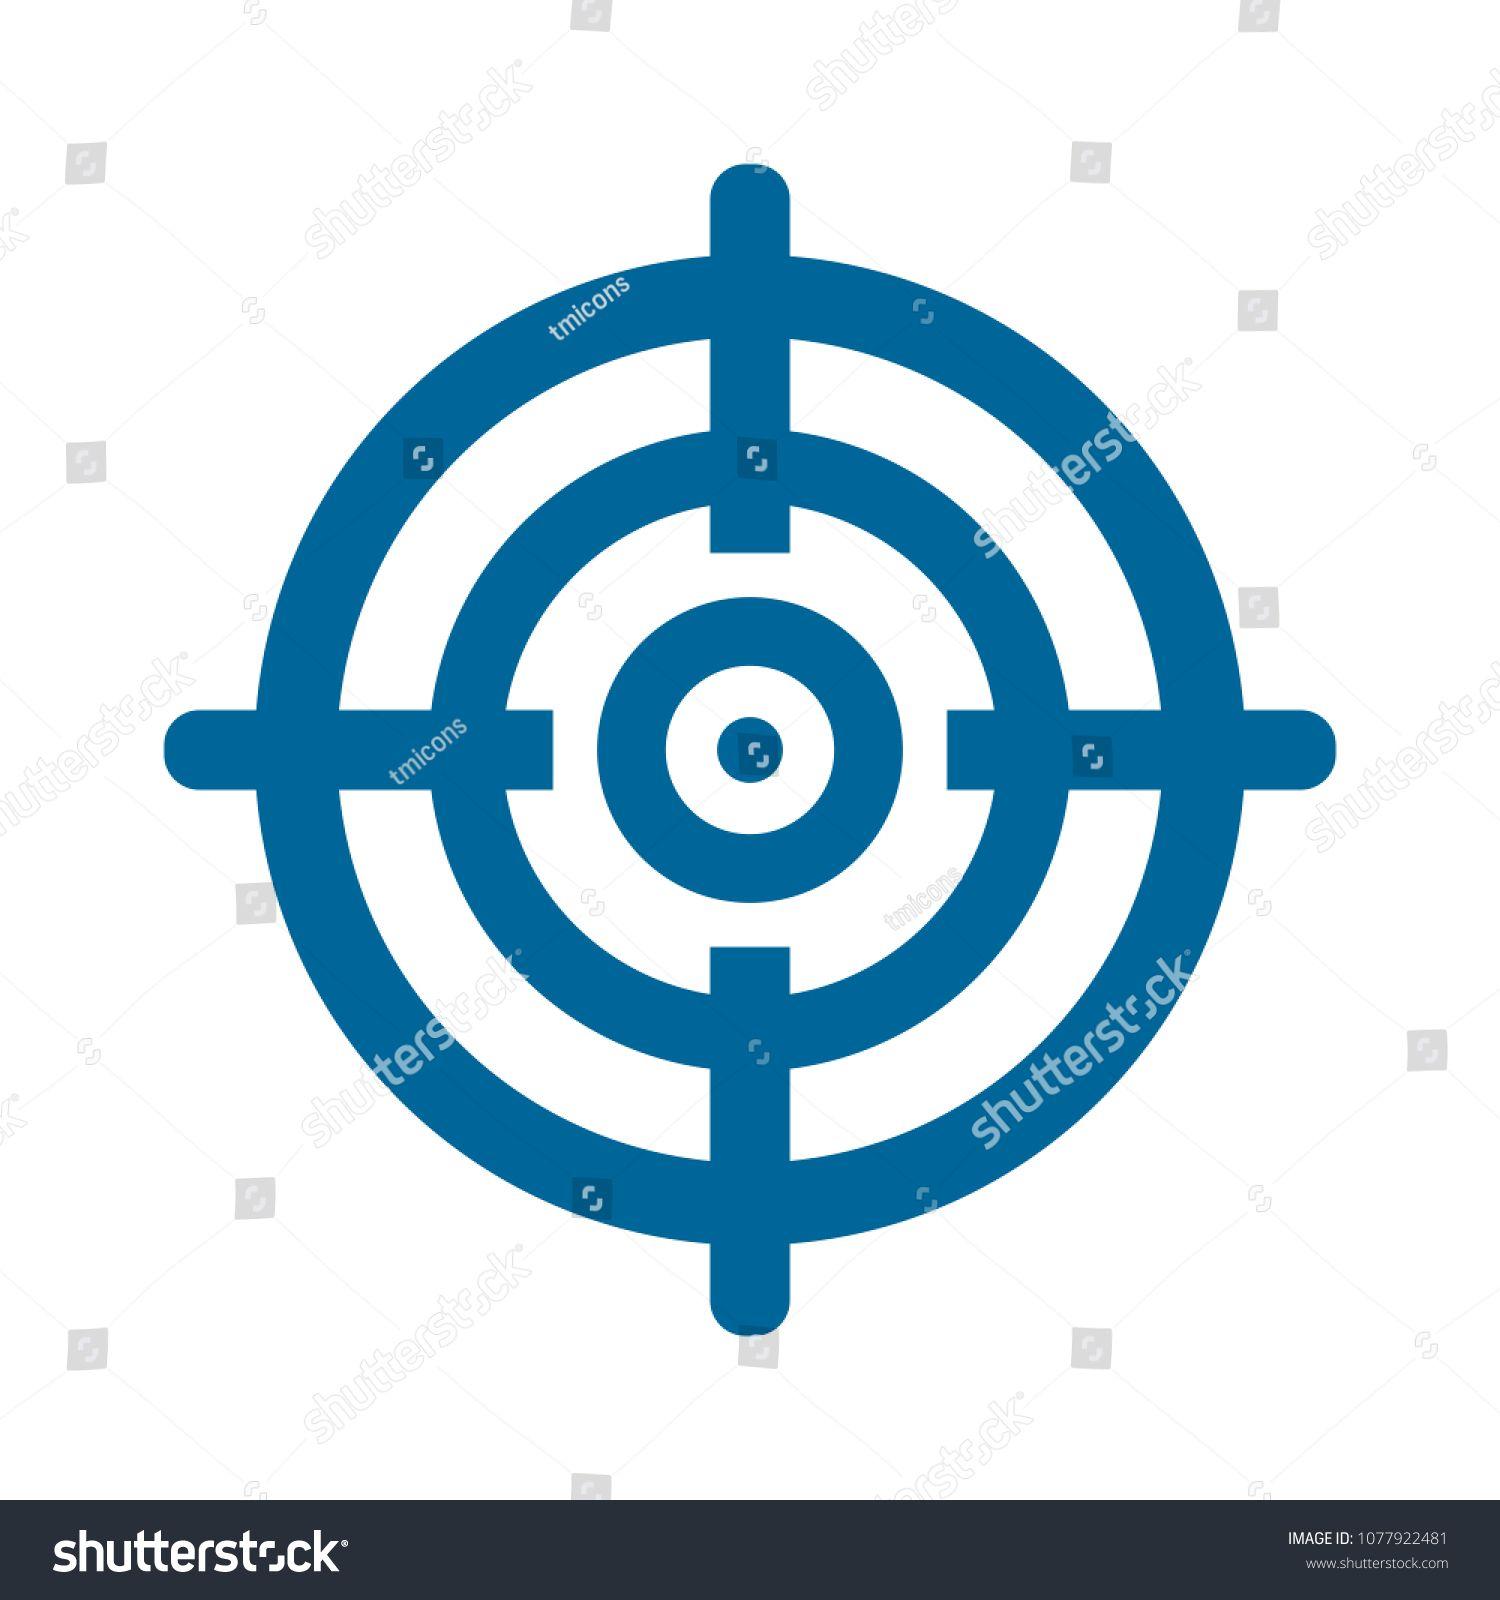 Target Goal Icon Target Focus Arrow Marketing Aim Sponsored Affiliate Icon Goal Target Focus Children Illustration Icon Stock Vector